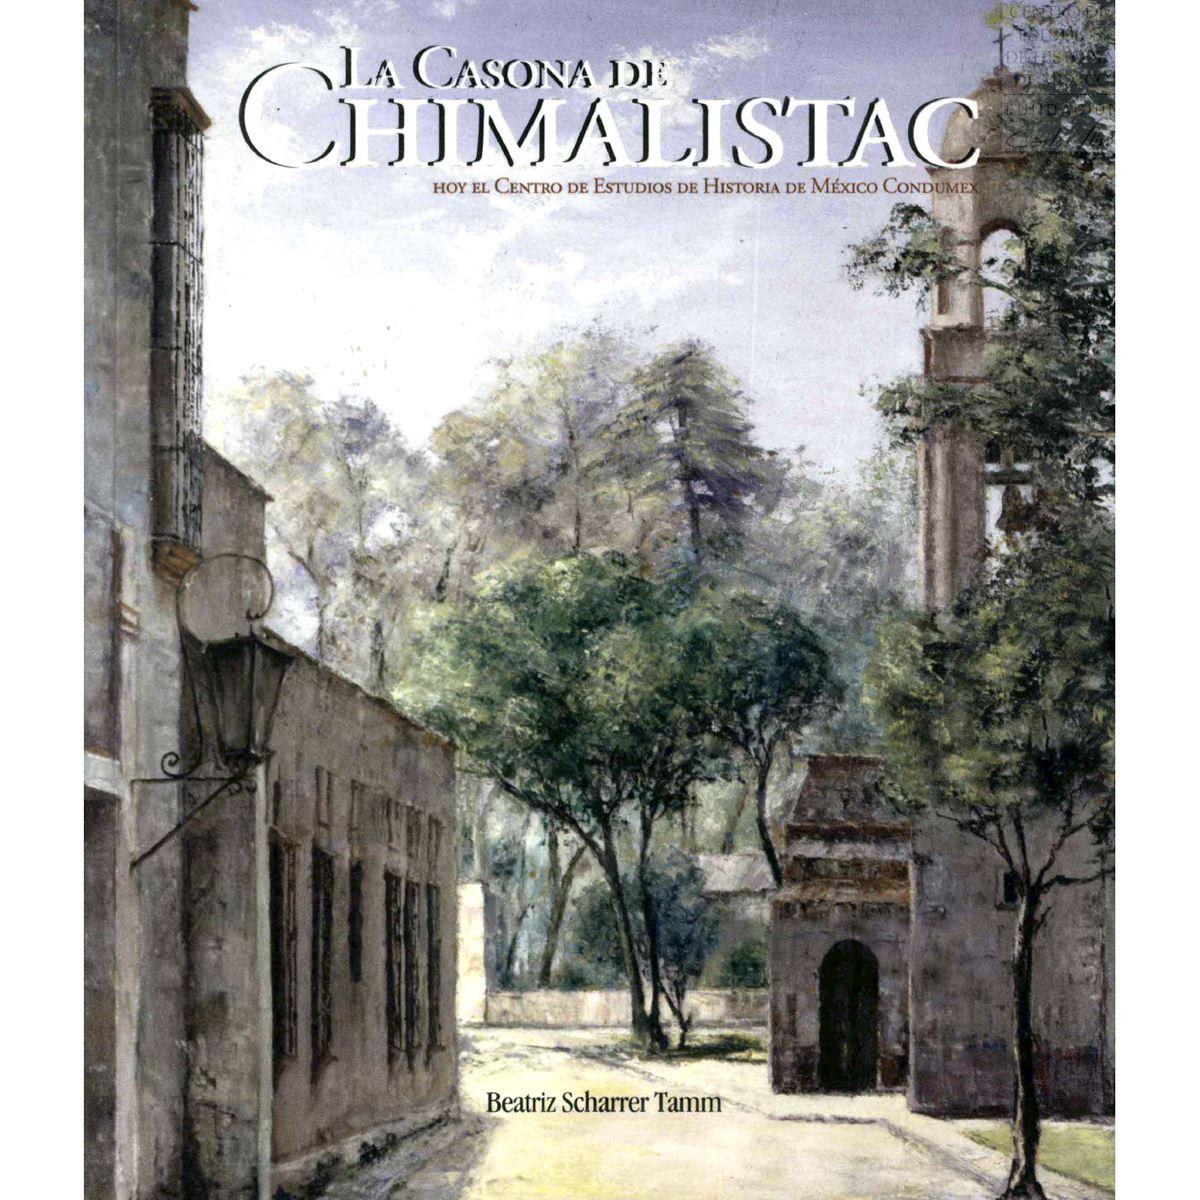 La Casona de Chimalistac